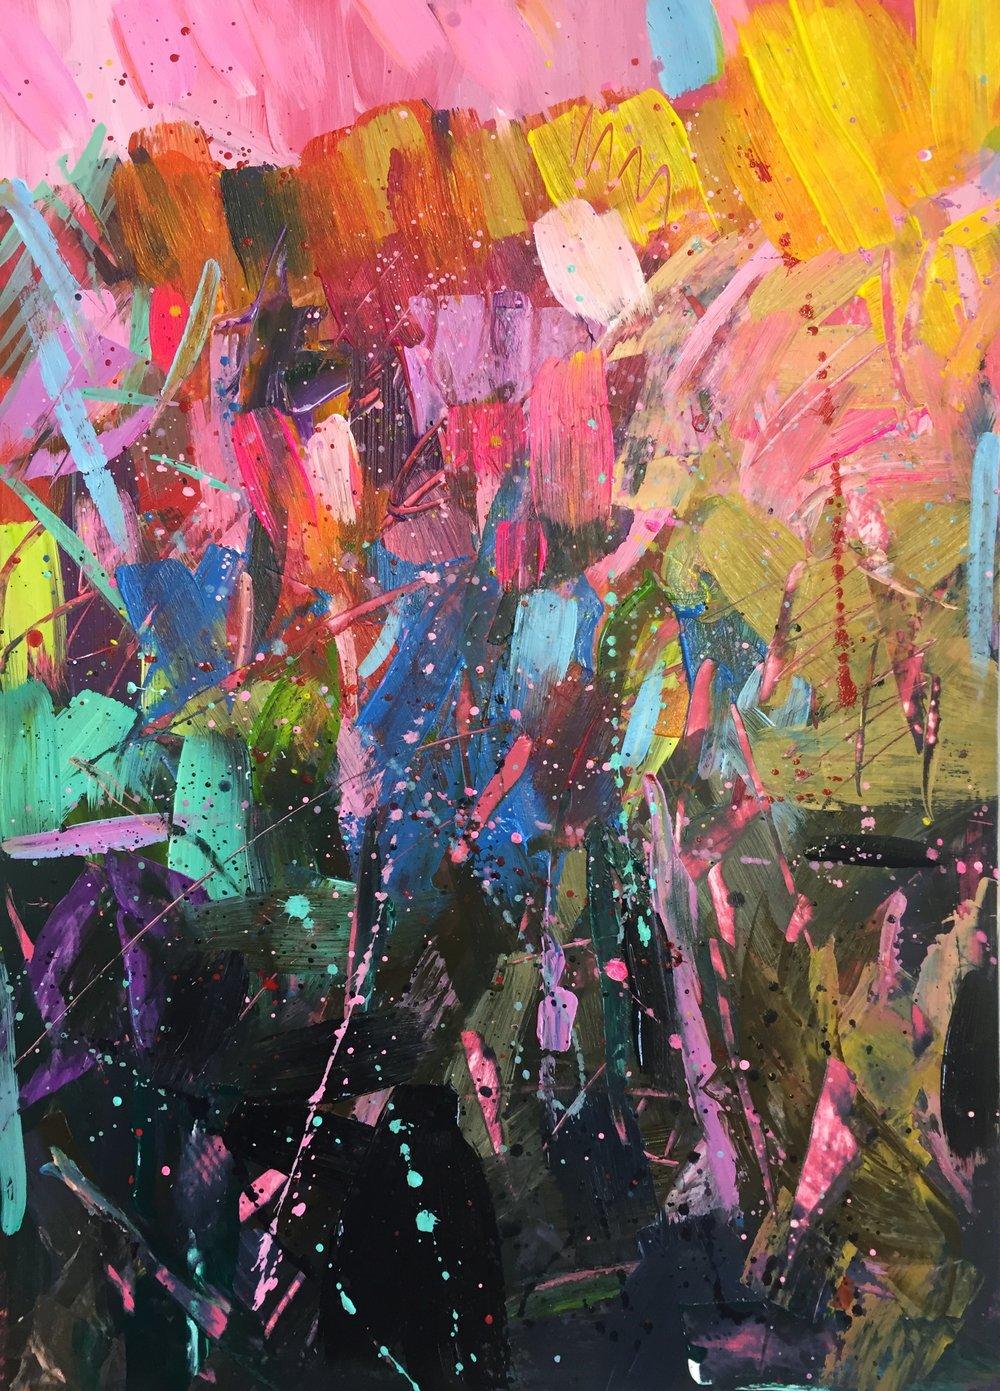 Image: Jane Lloyd, Abbotts Ann Arts participant 2017.